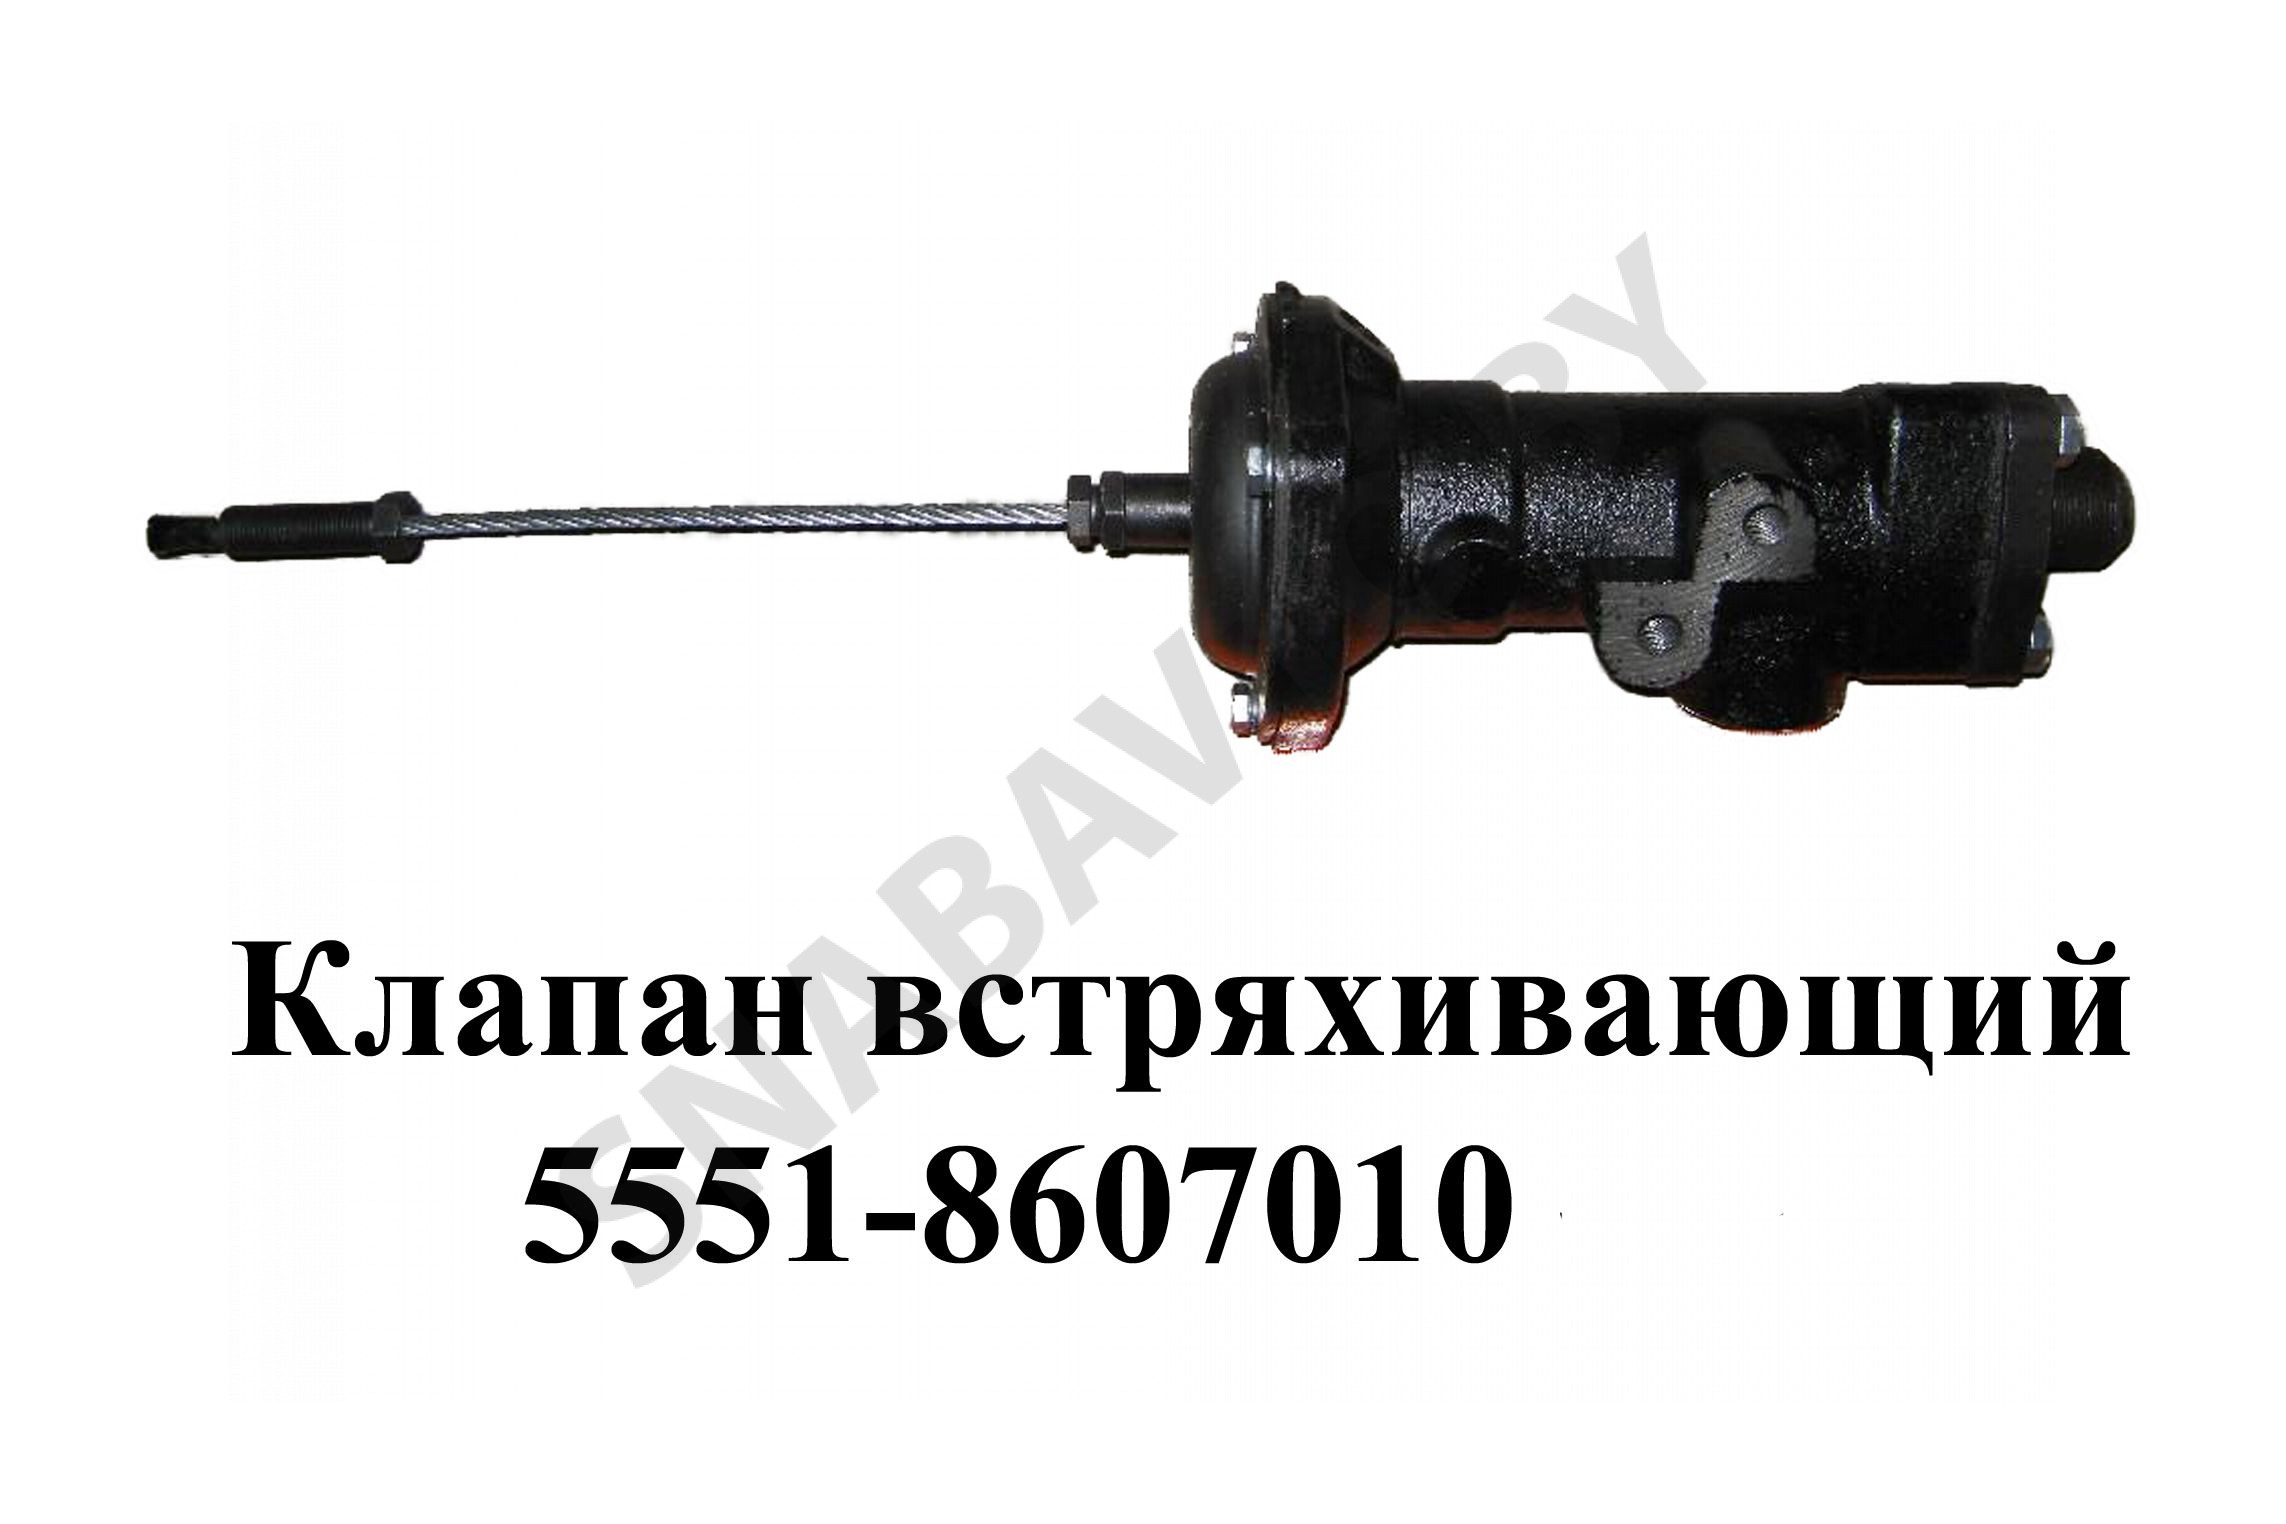 5551-8607010